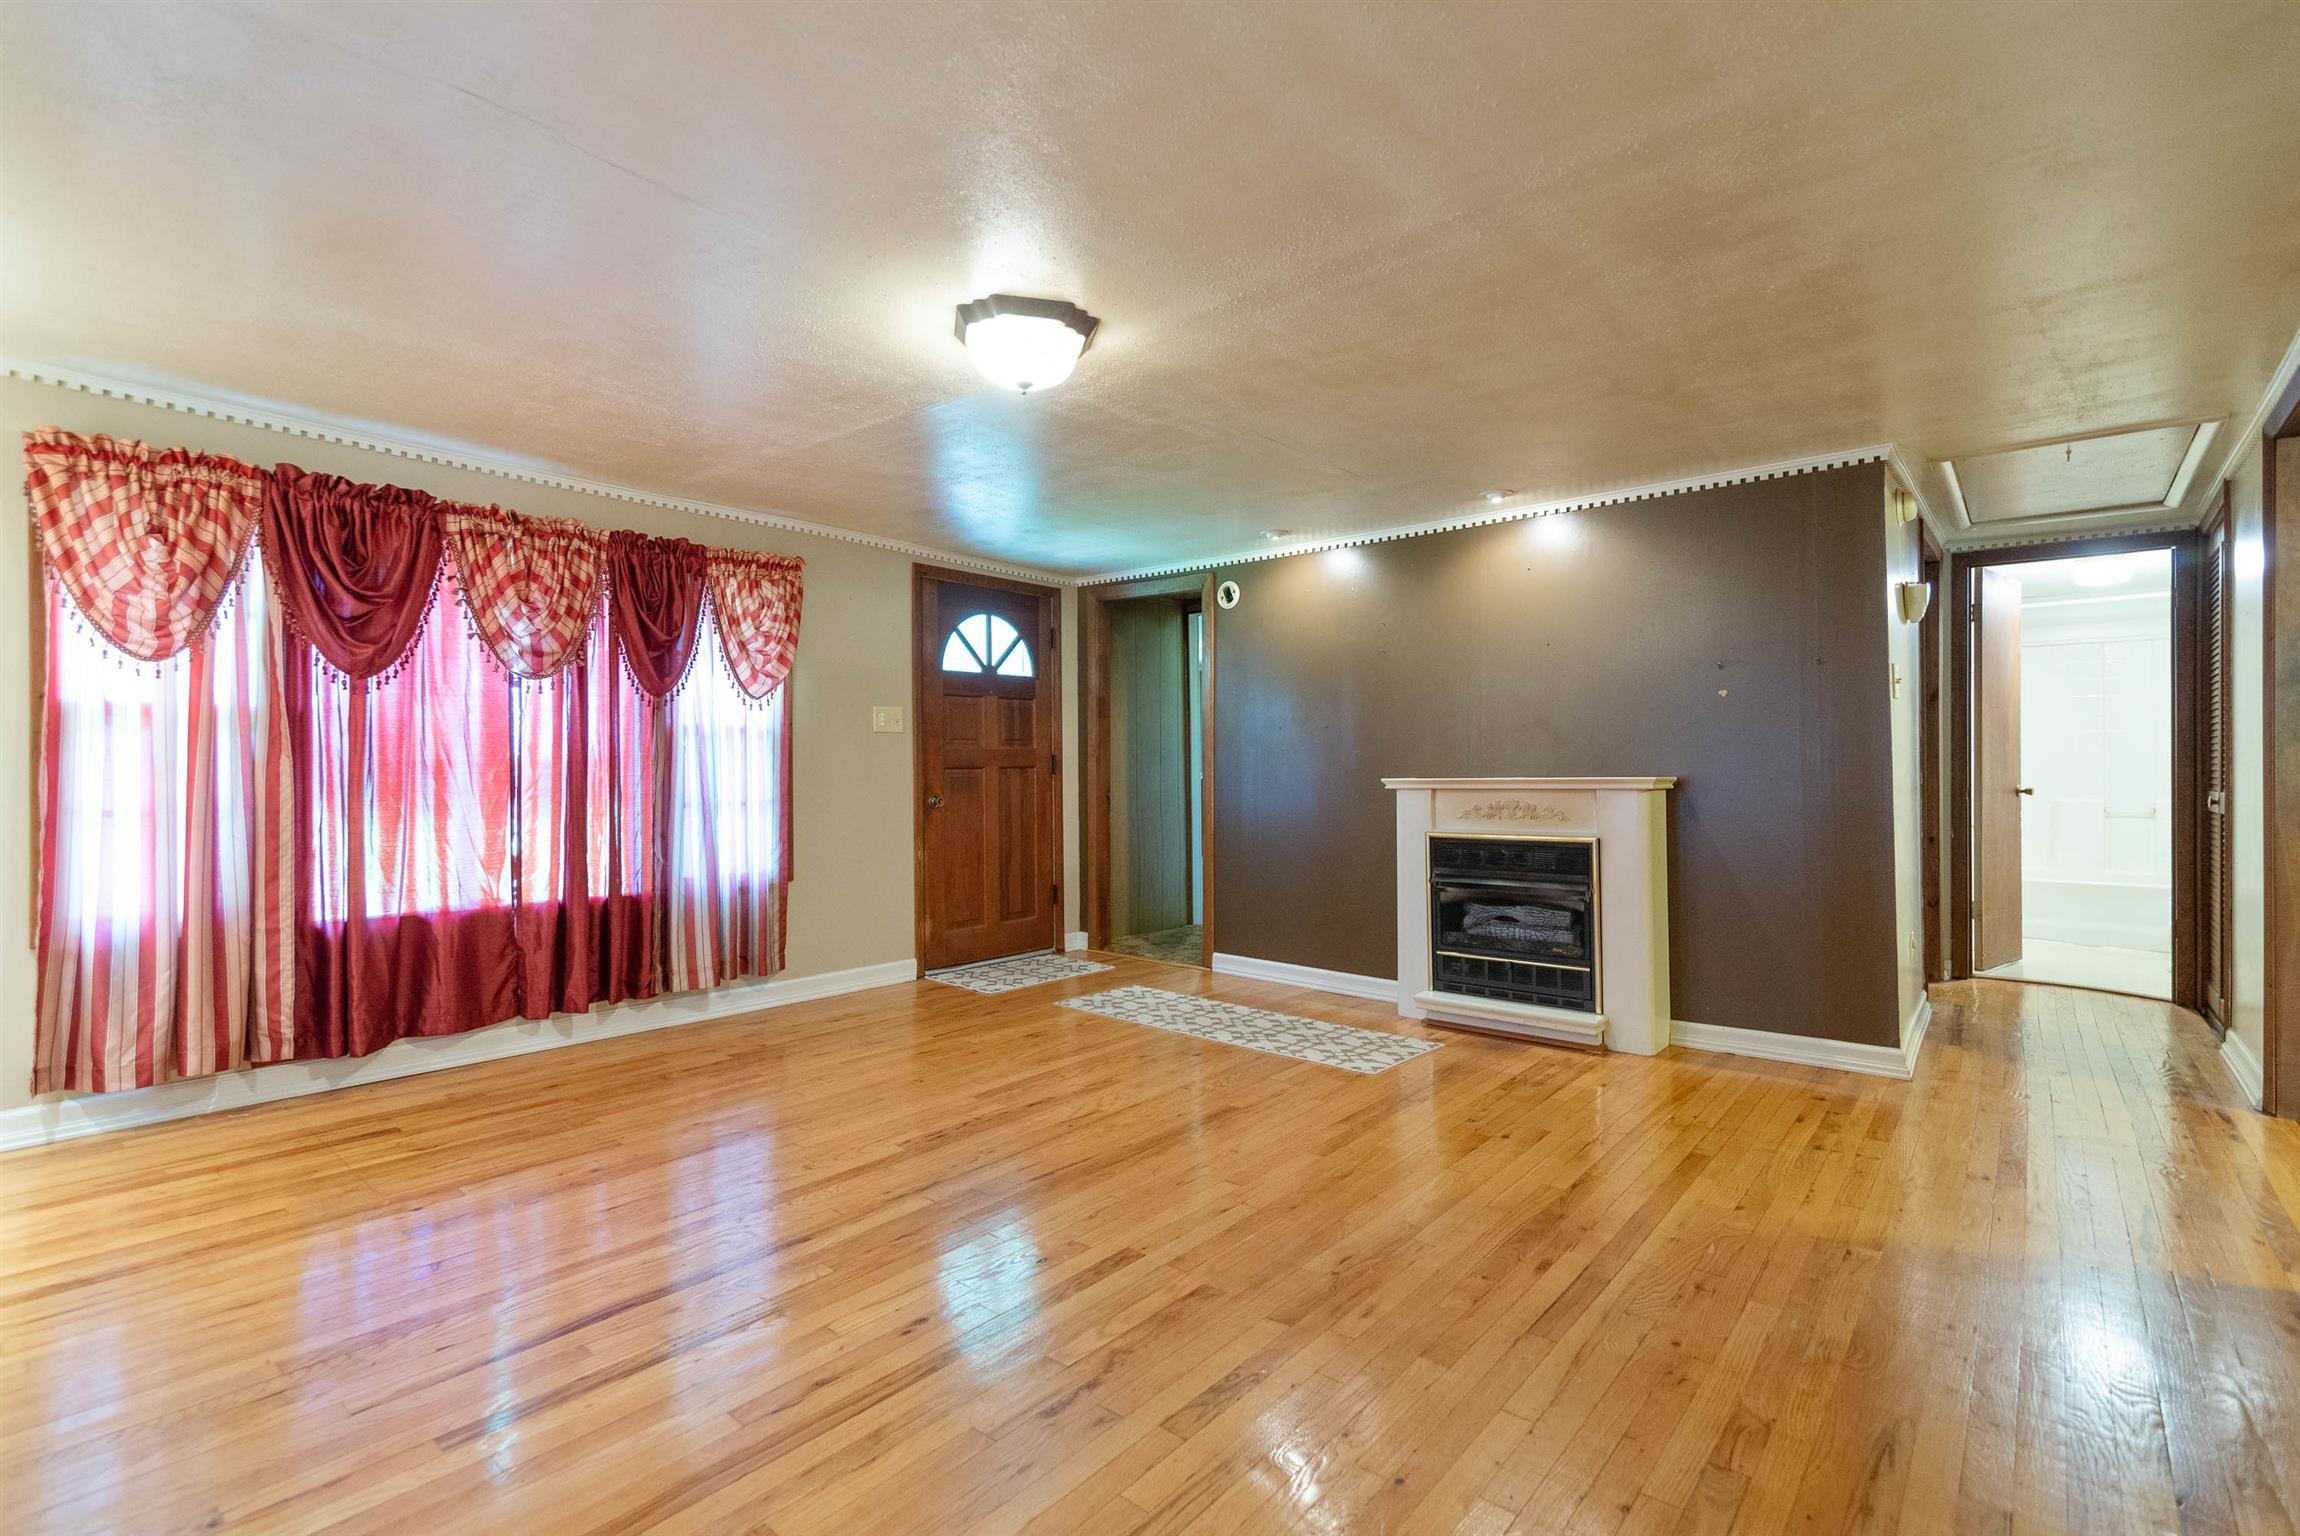 767 Palmyra Rd, Clarksville, TN 37040 - Clarksville, TN real estate listing